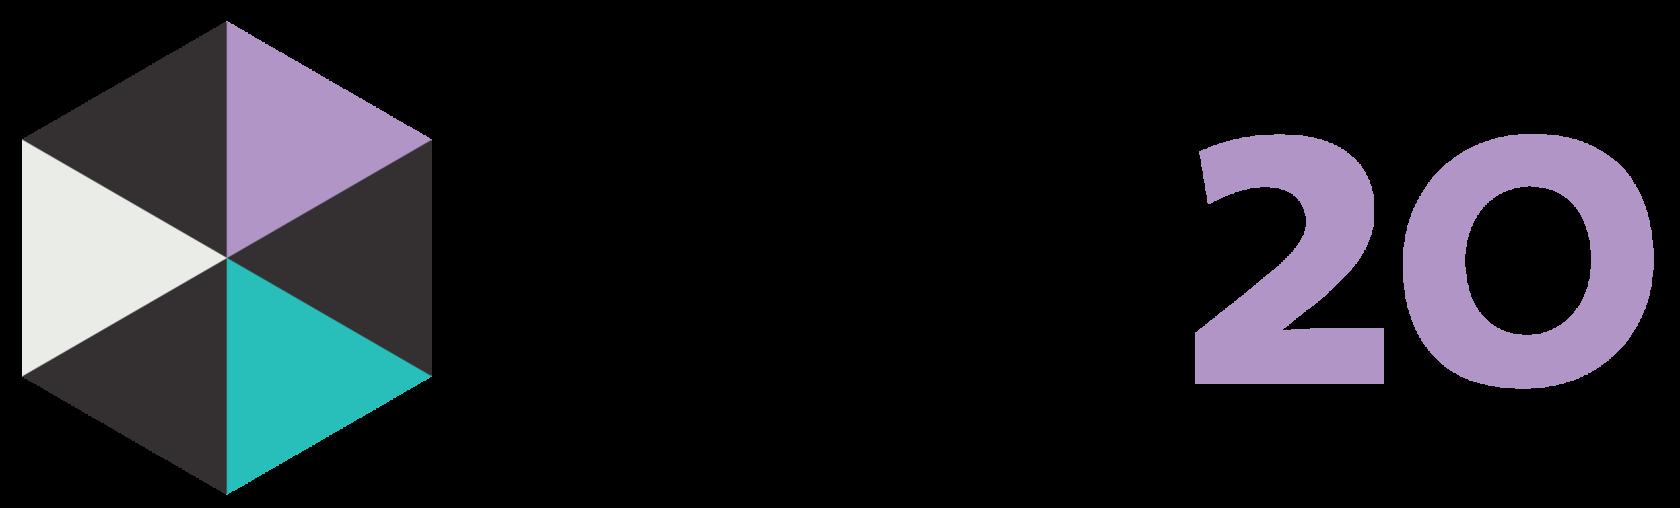 SELF20-logo